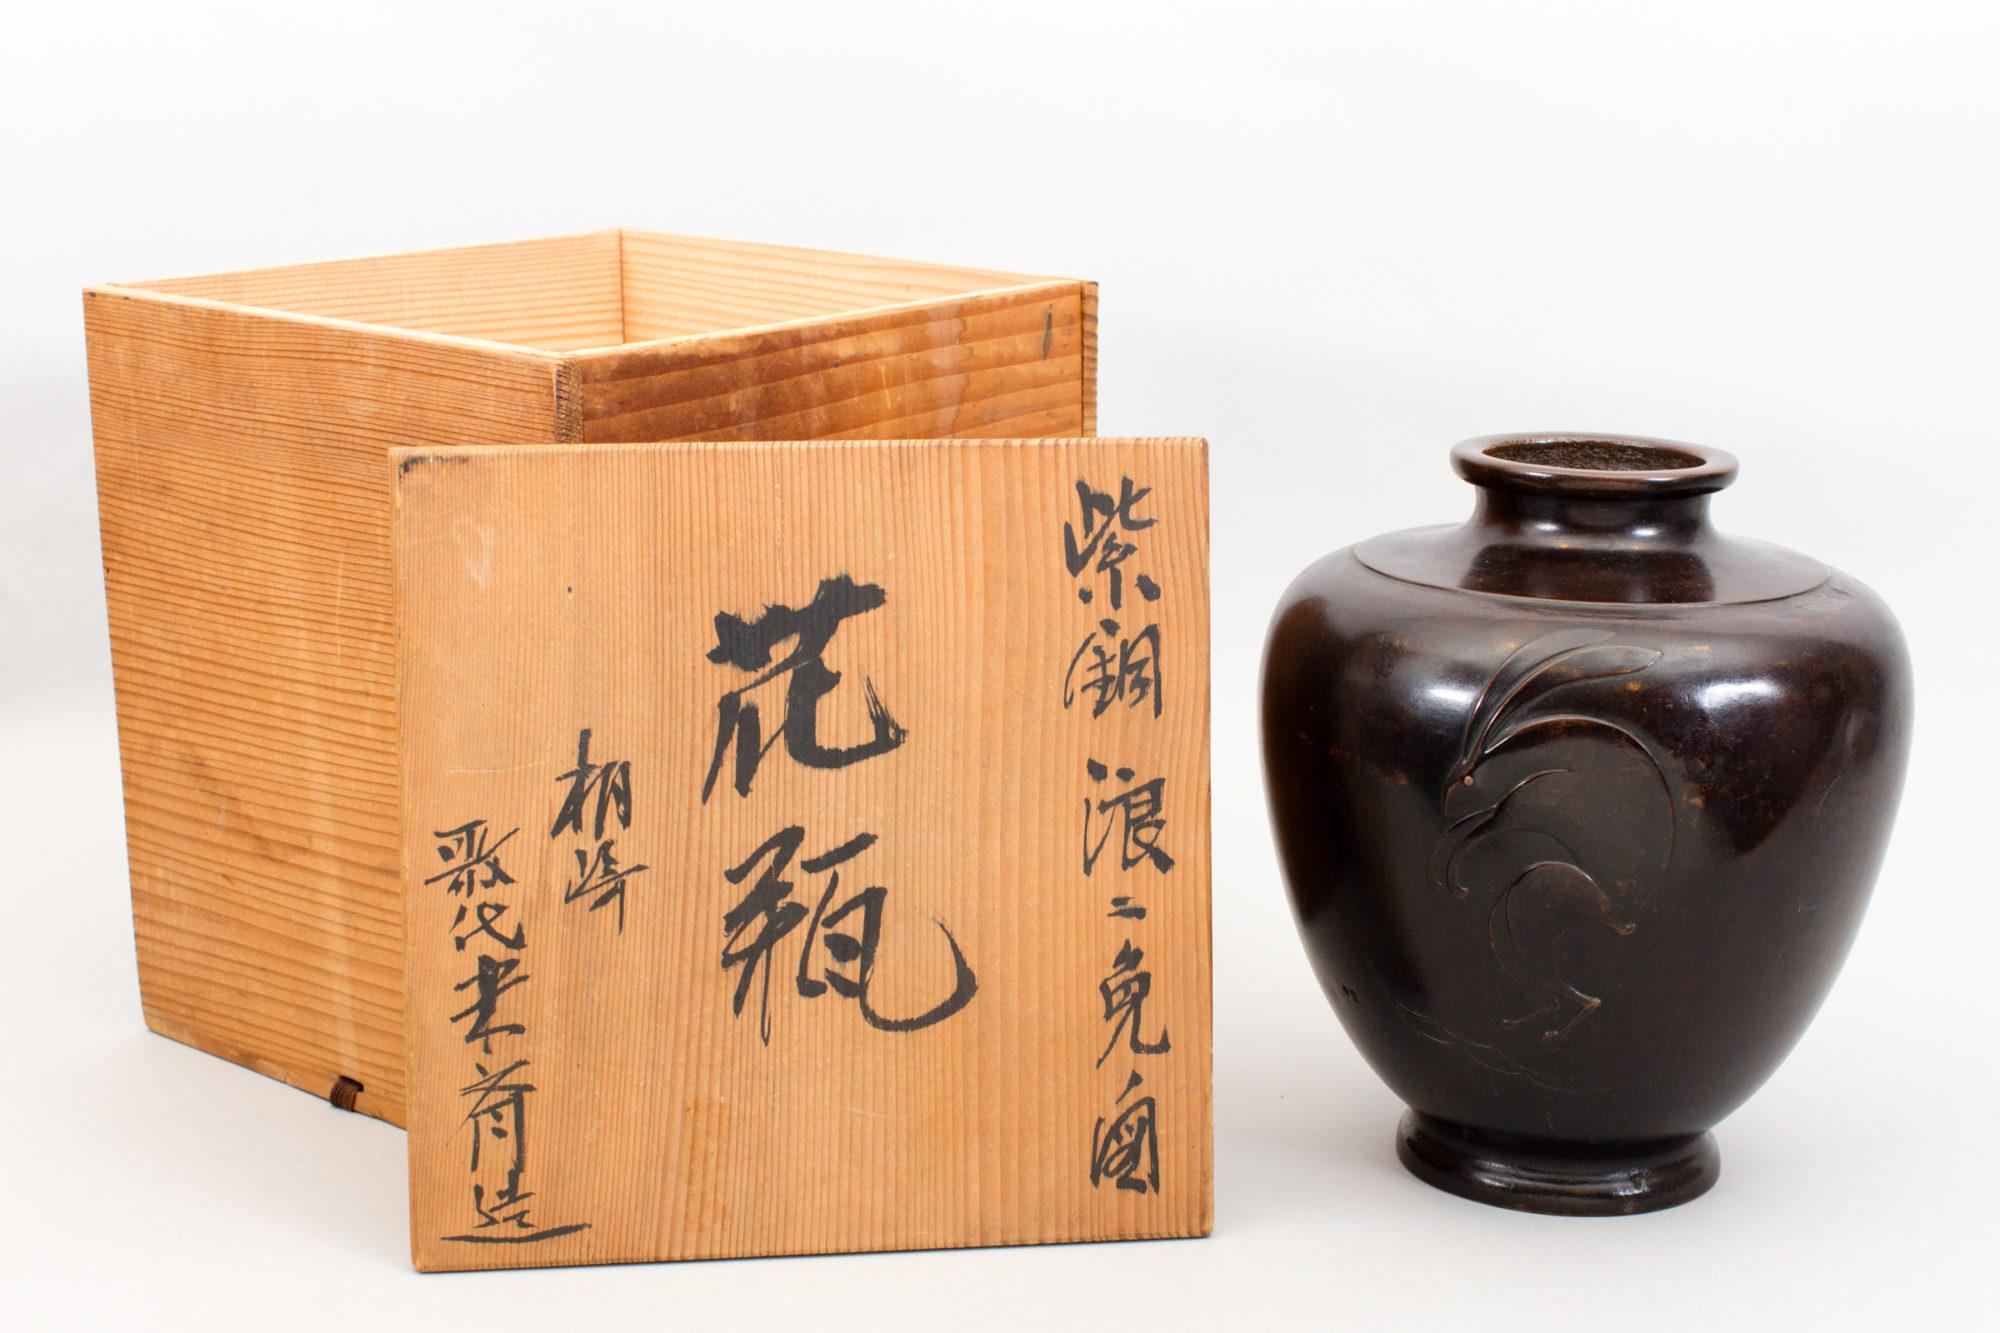 Japanese Bronze Vase with Rabbit Design